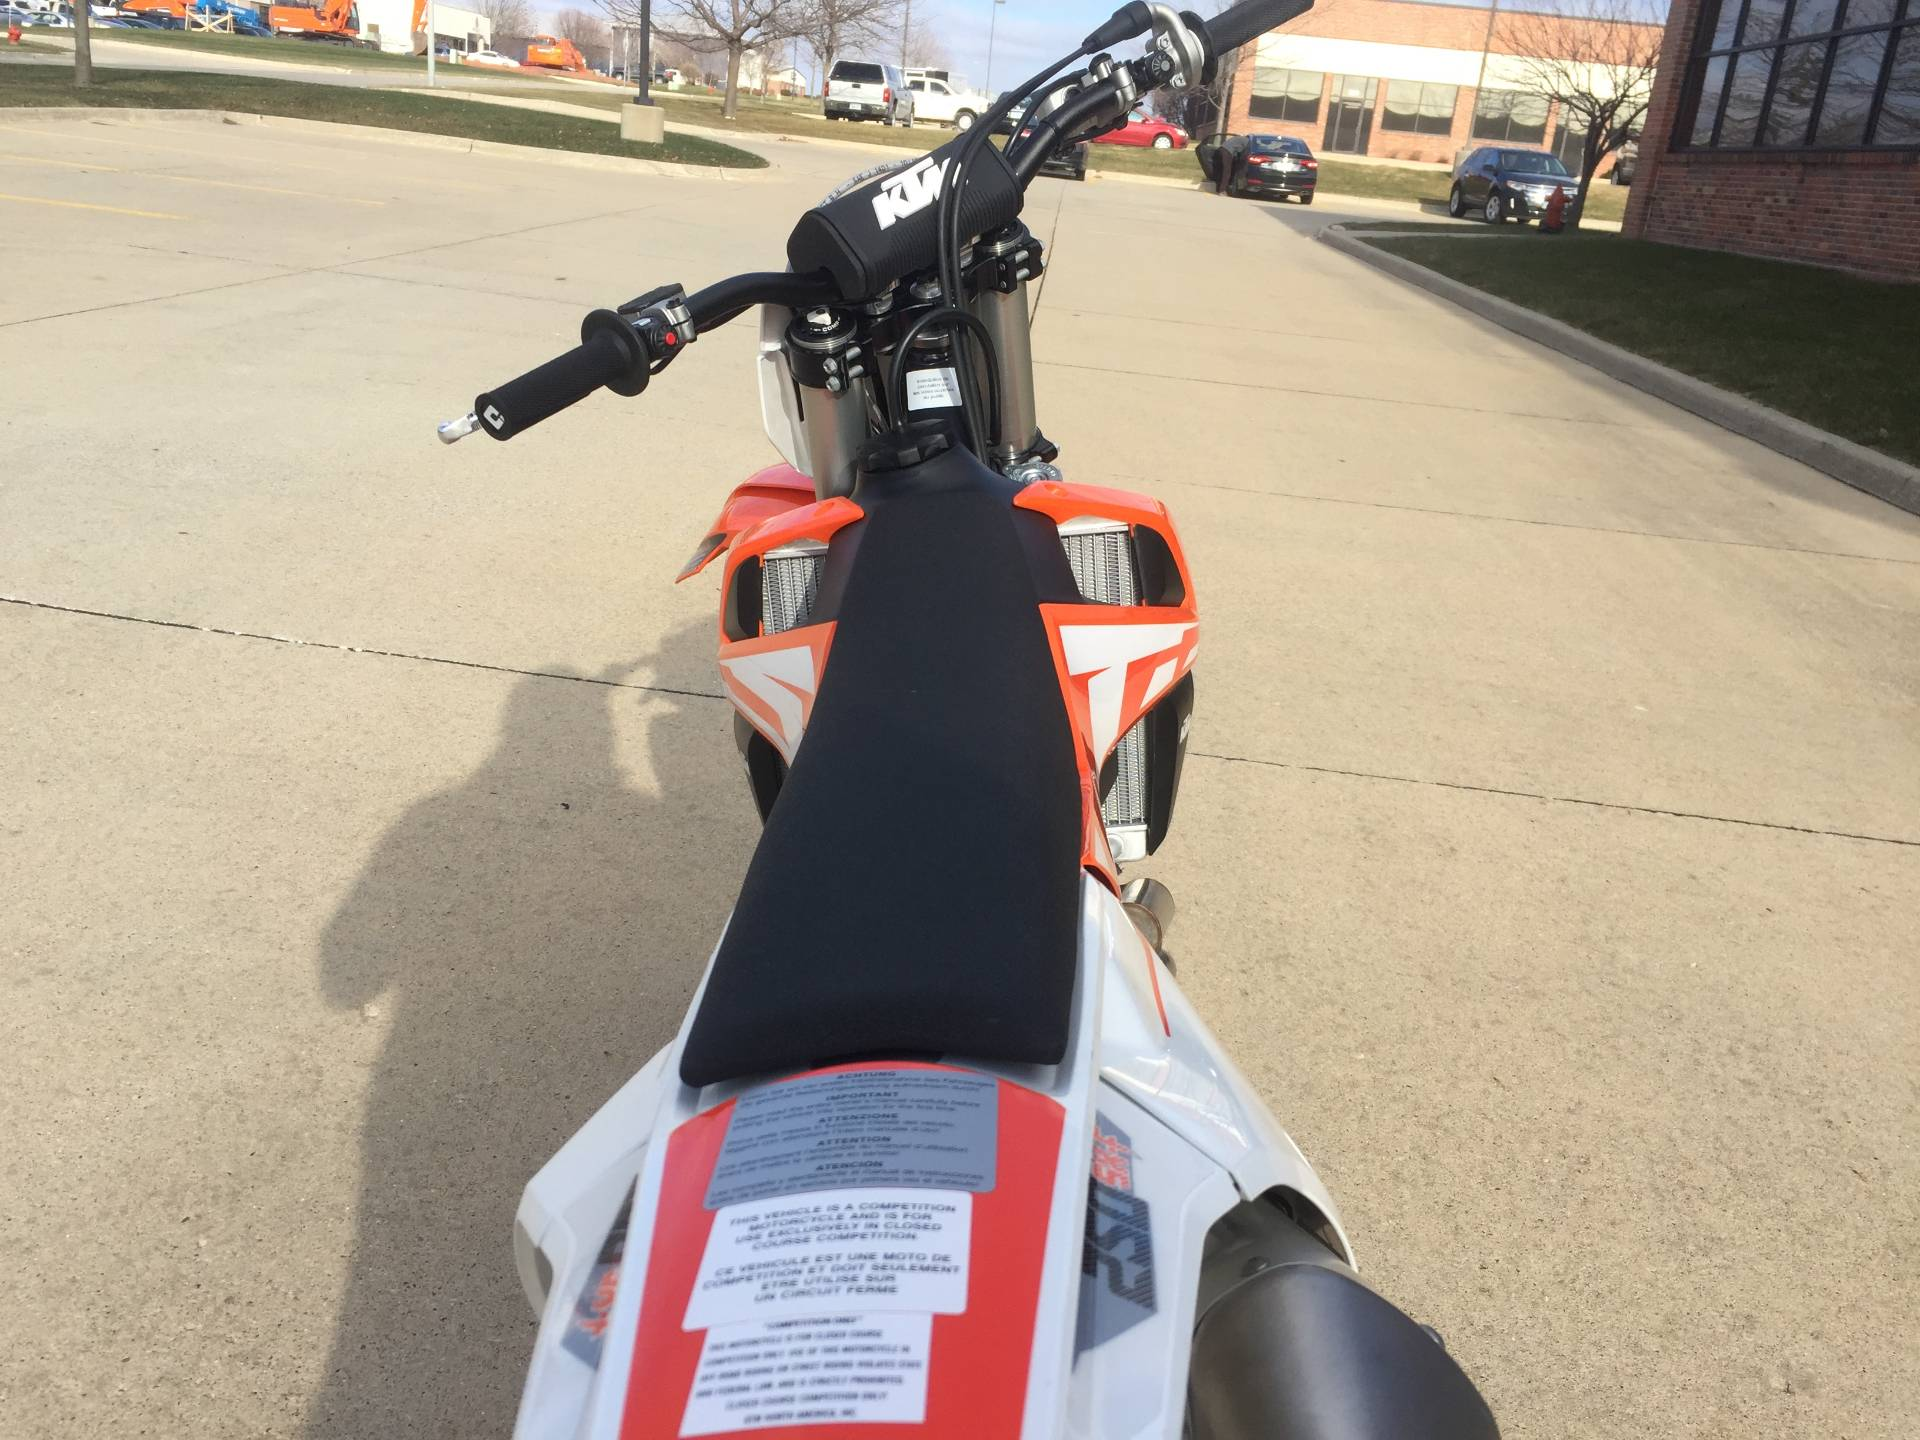 2016 KTM 250 SX-F in Grimes, Iowa